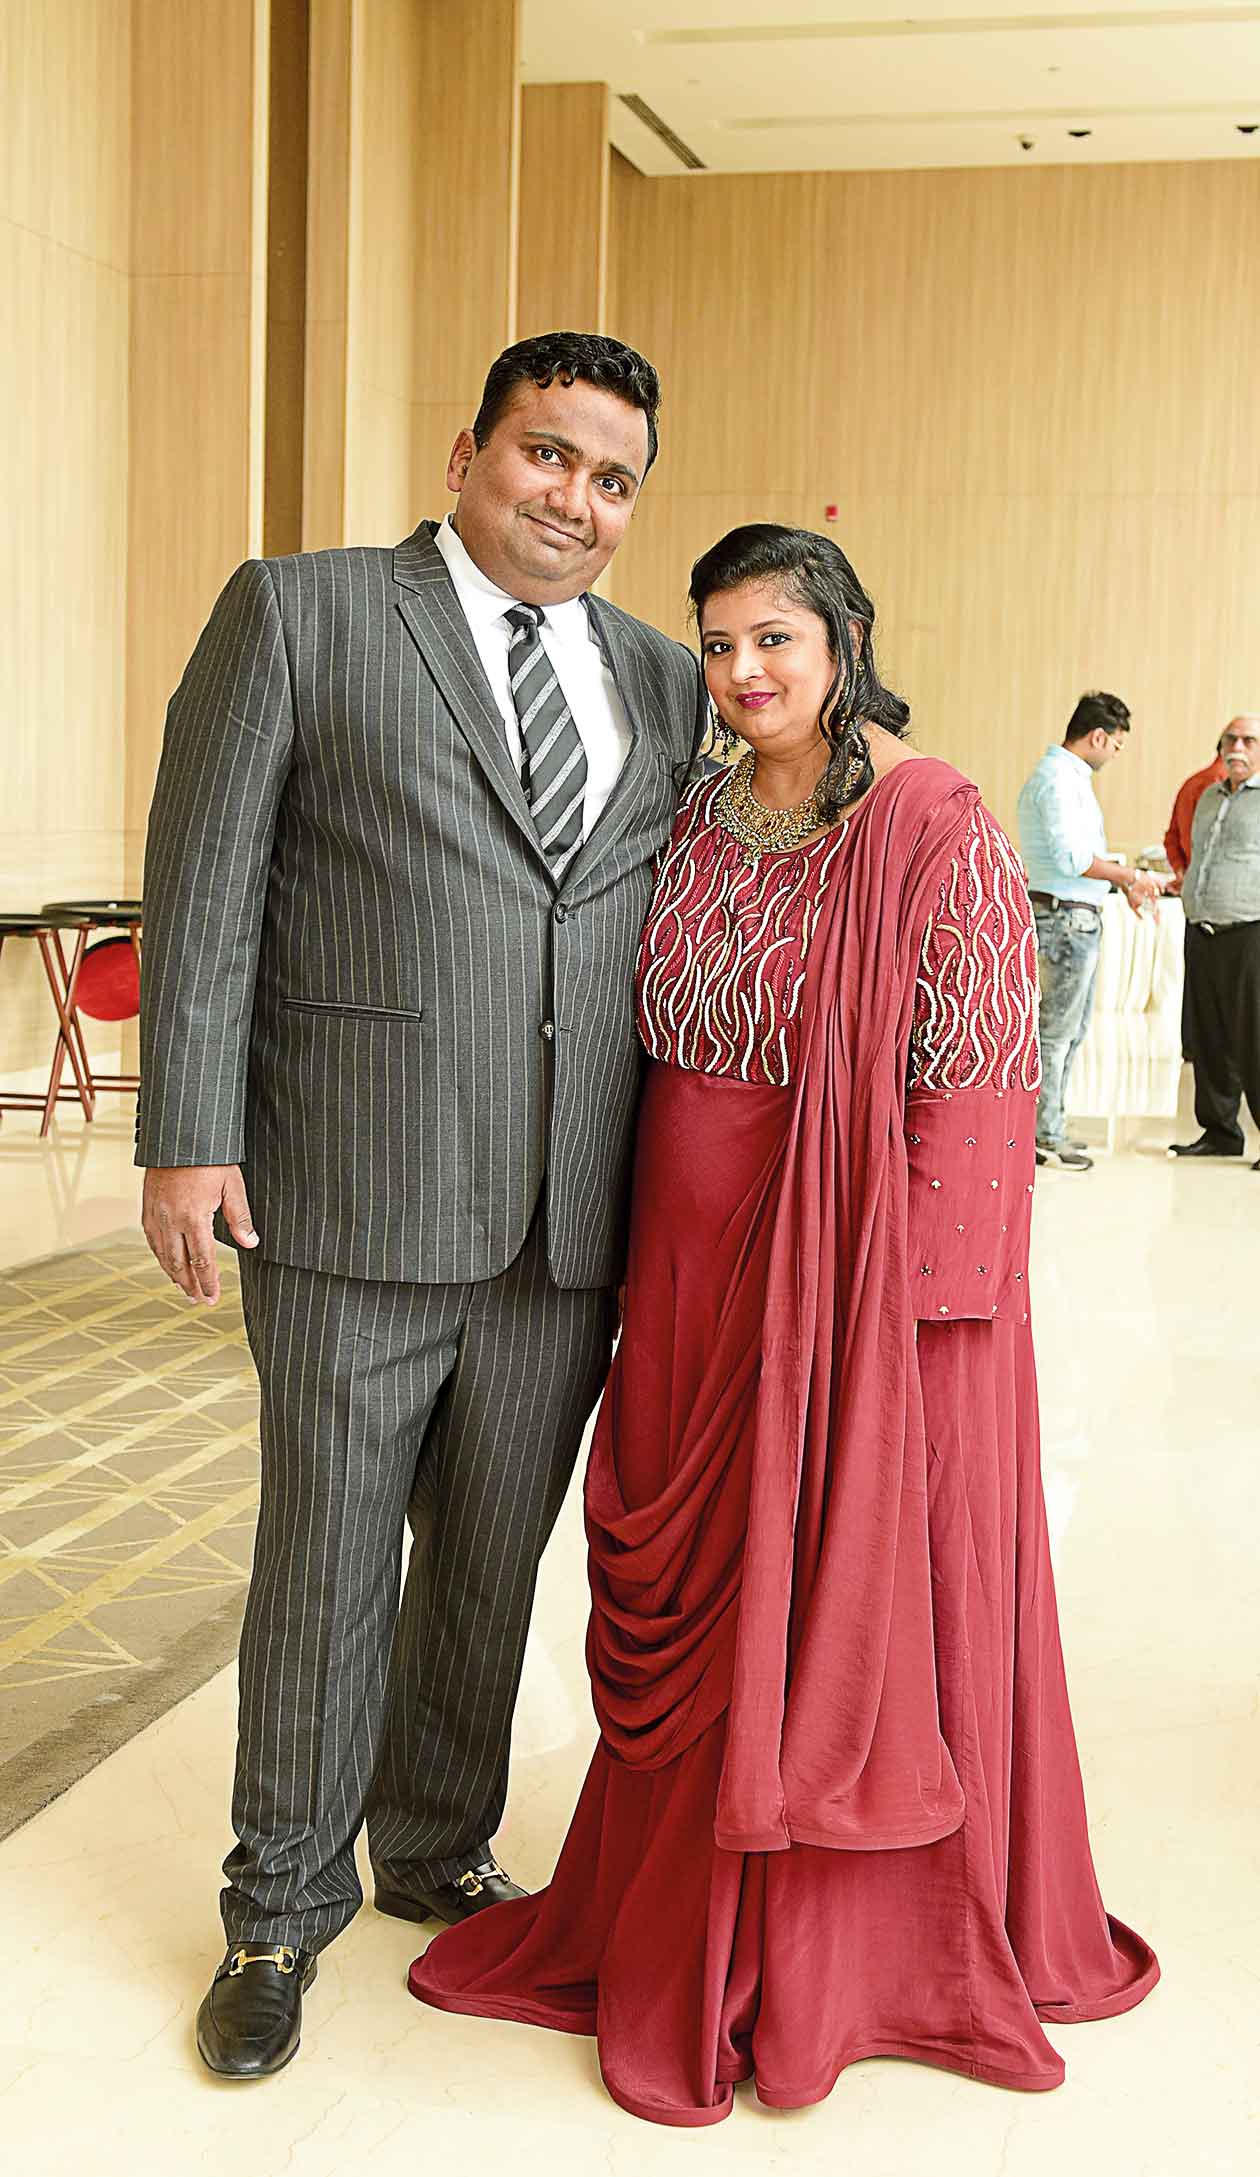 pg3_wedding